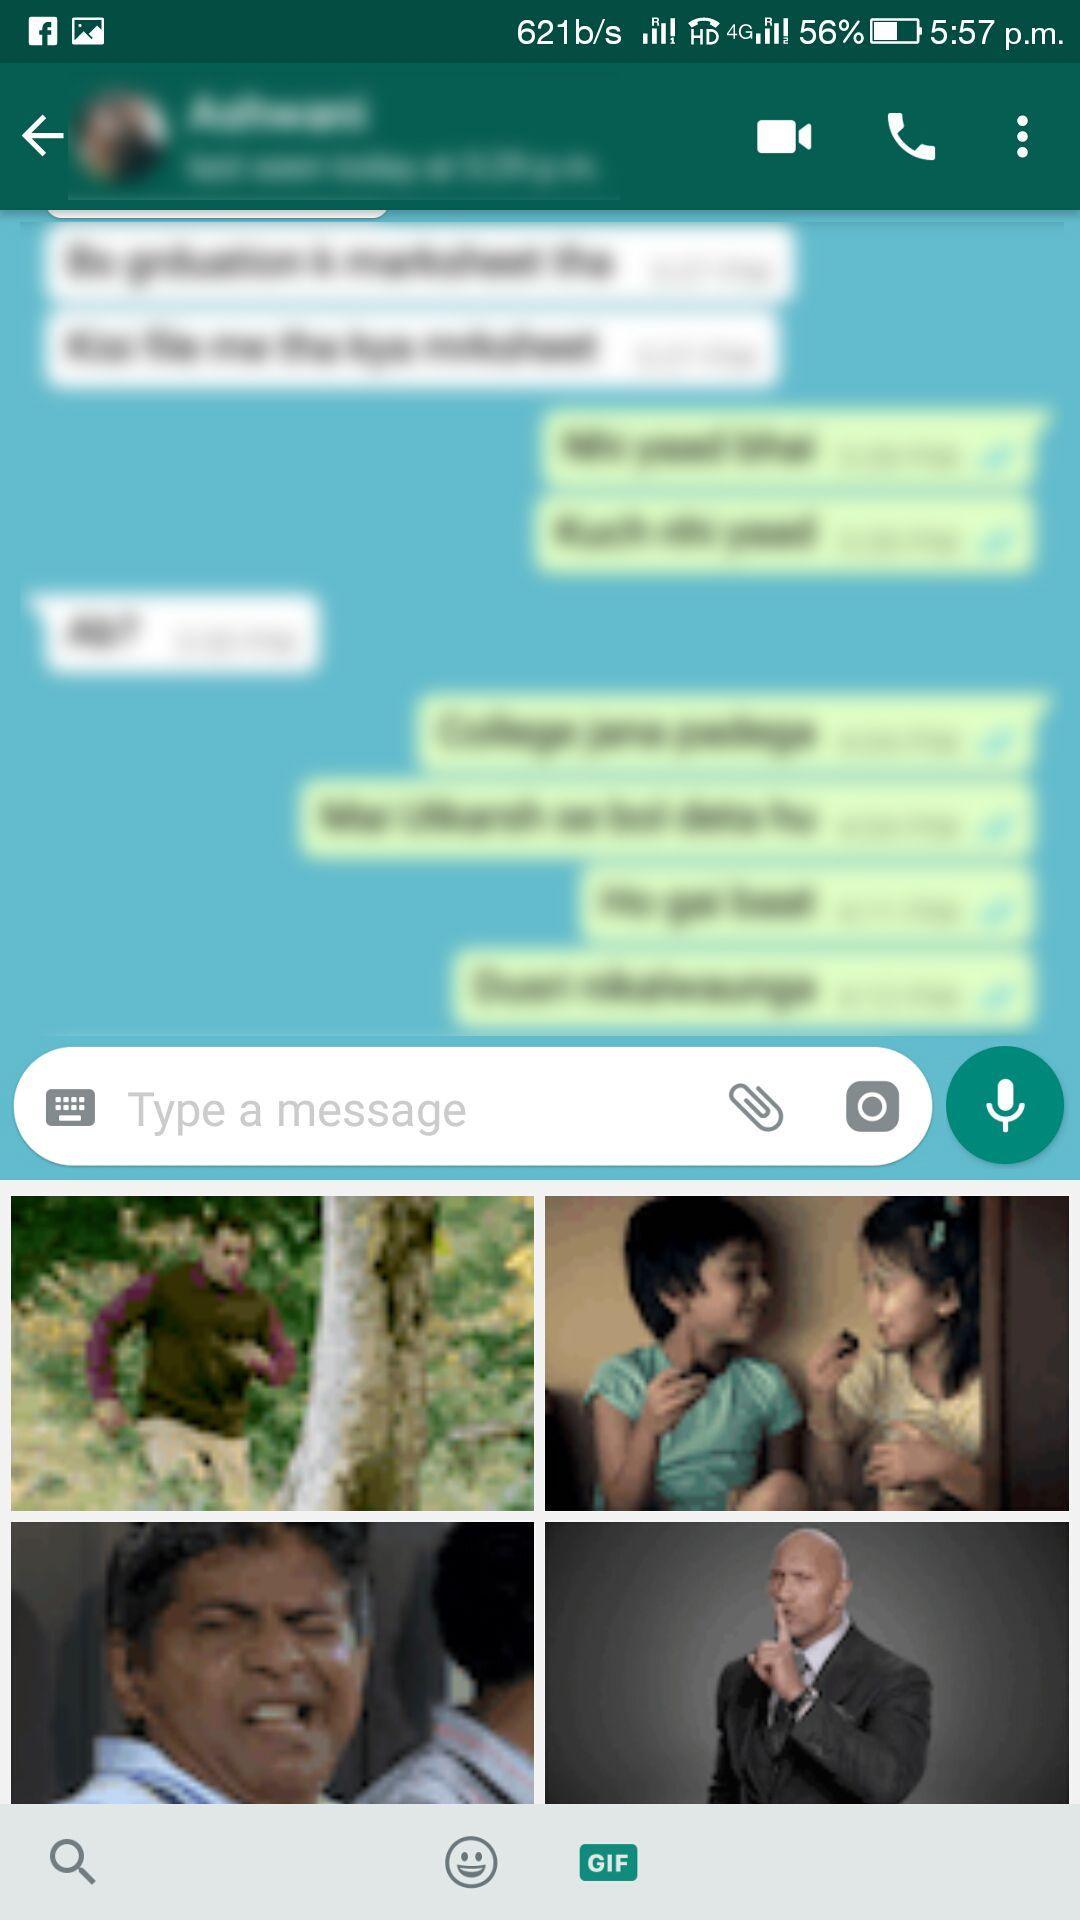 Sending GIF in WhatsApp